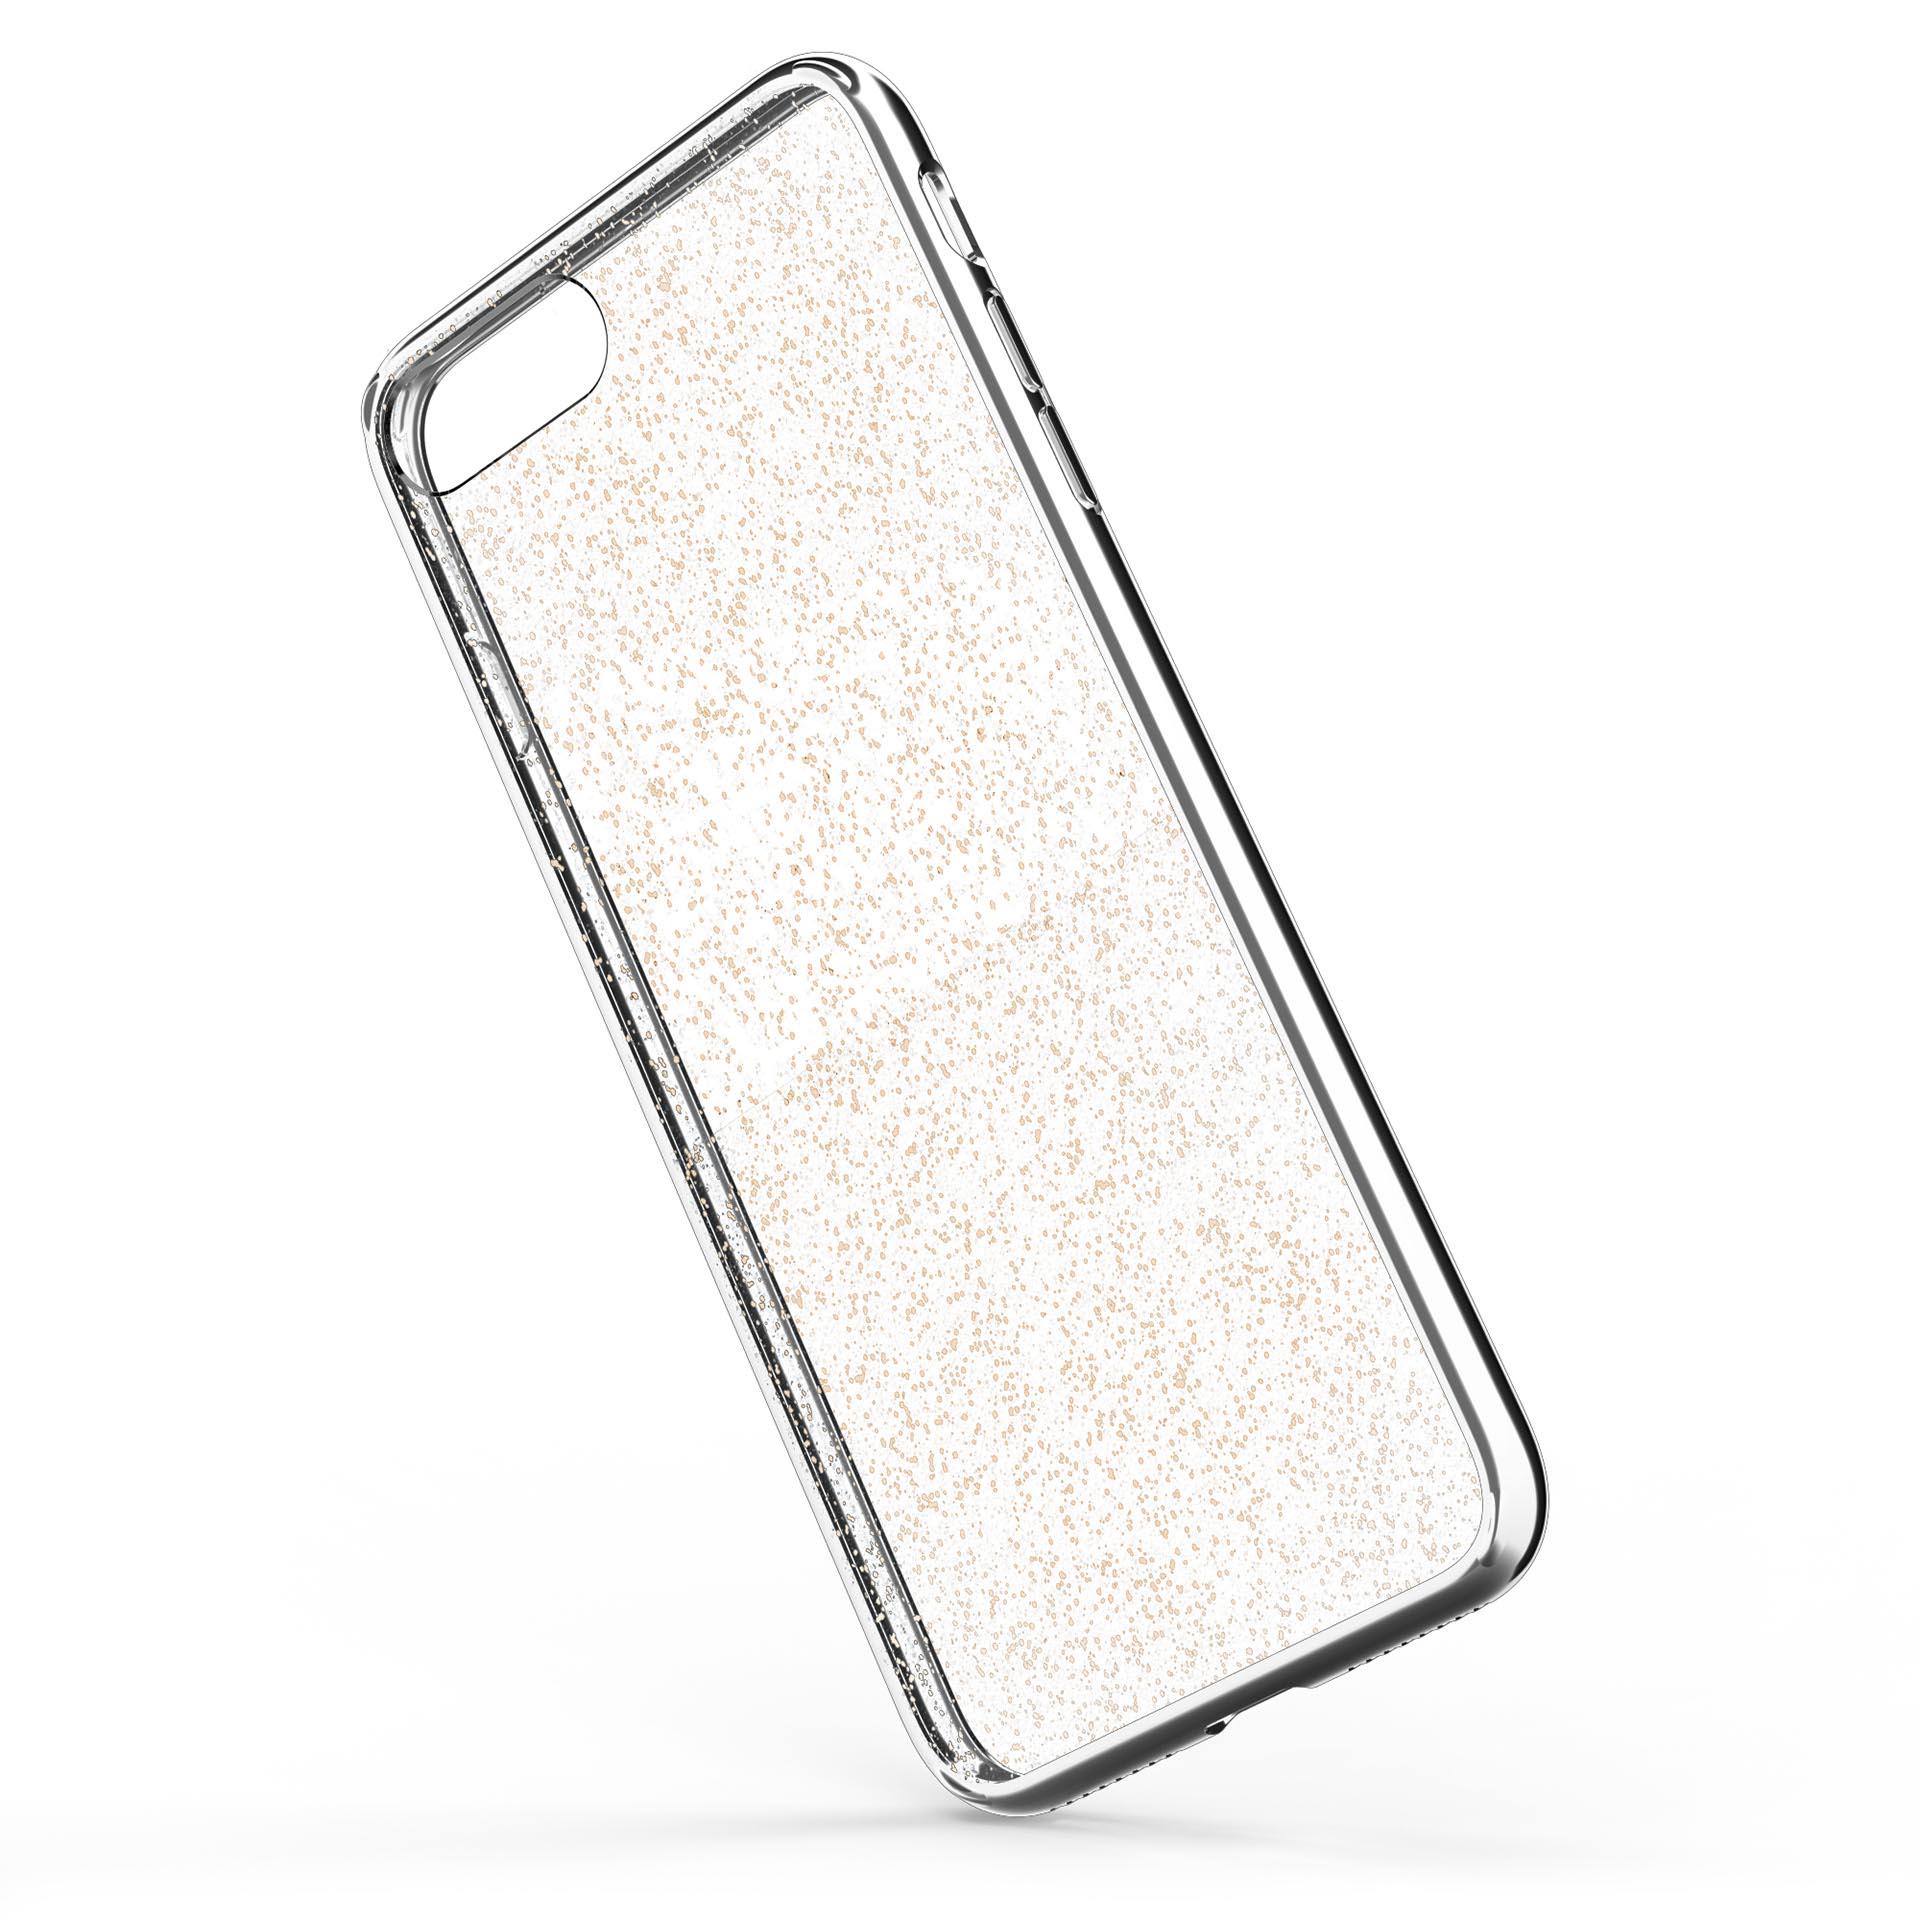 Iphone 8 Plus 7 Plus Case Refine Series By Zizo Slim